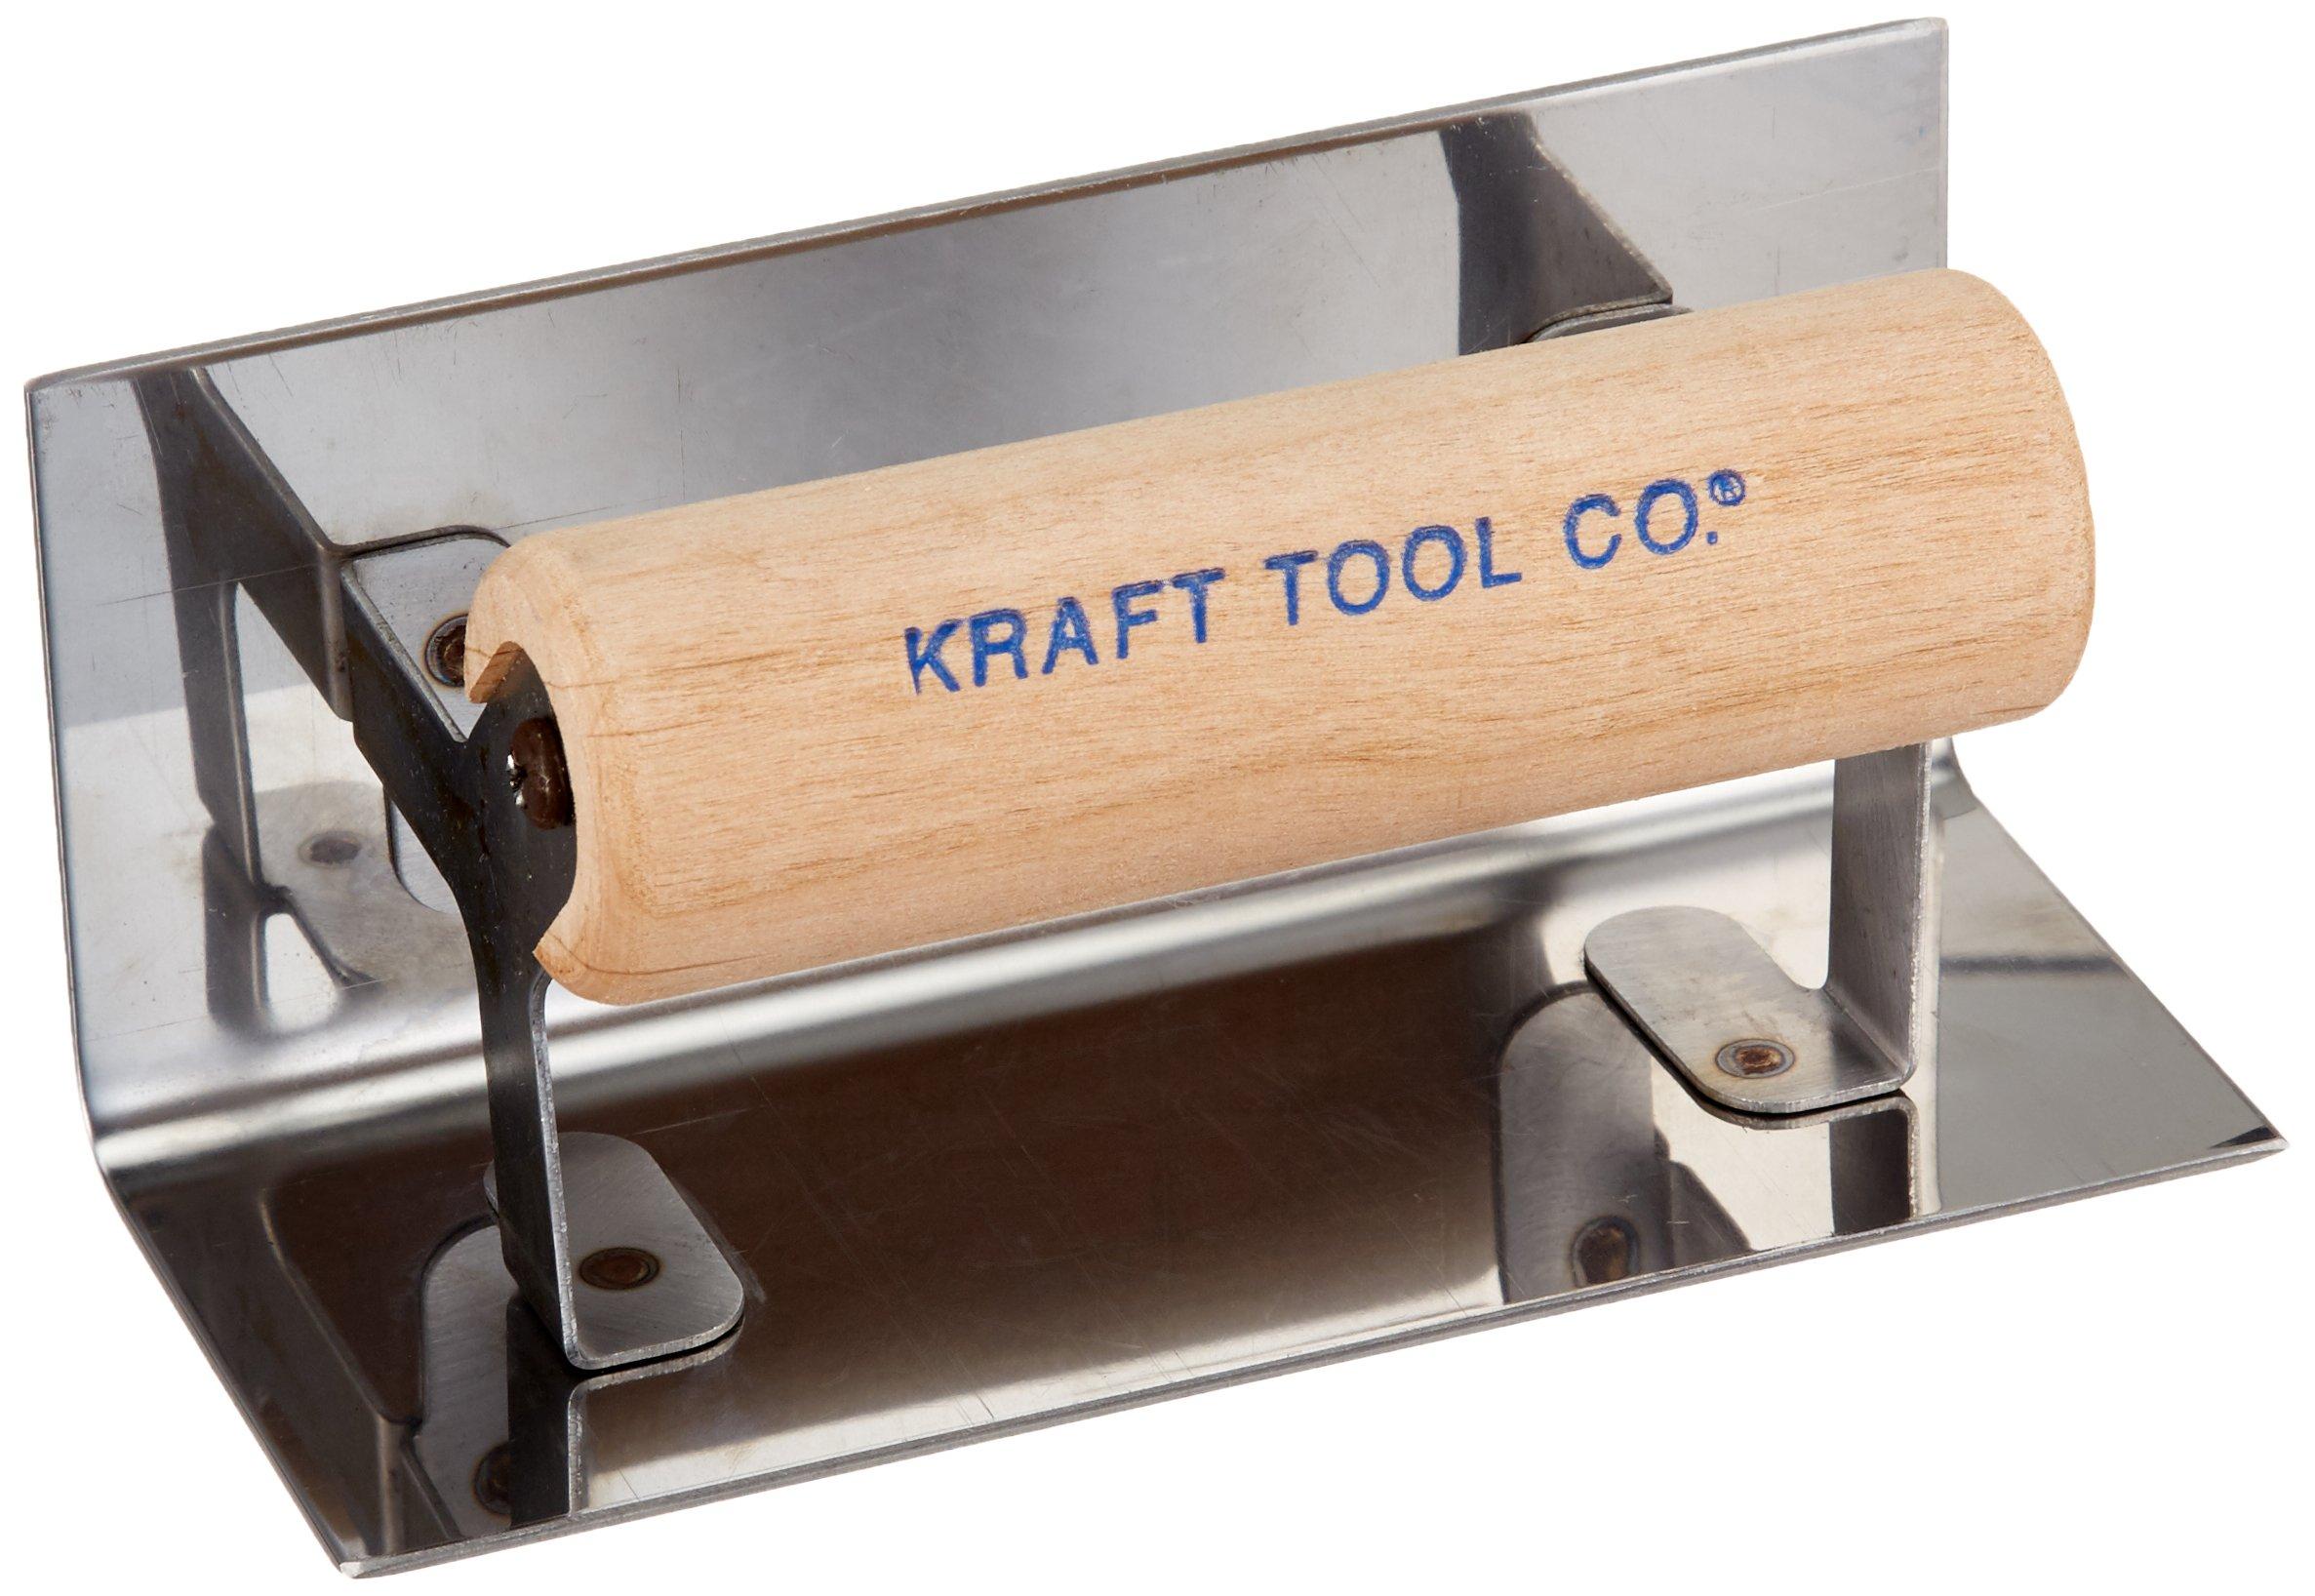 Kraft Tool CF126 1/4-Inch Radius Inside Step Tool with Wood Handle, 6 x 2-1/2-Inch